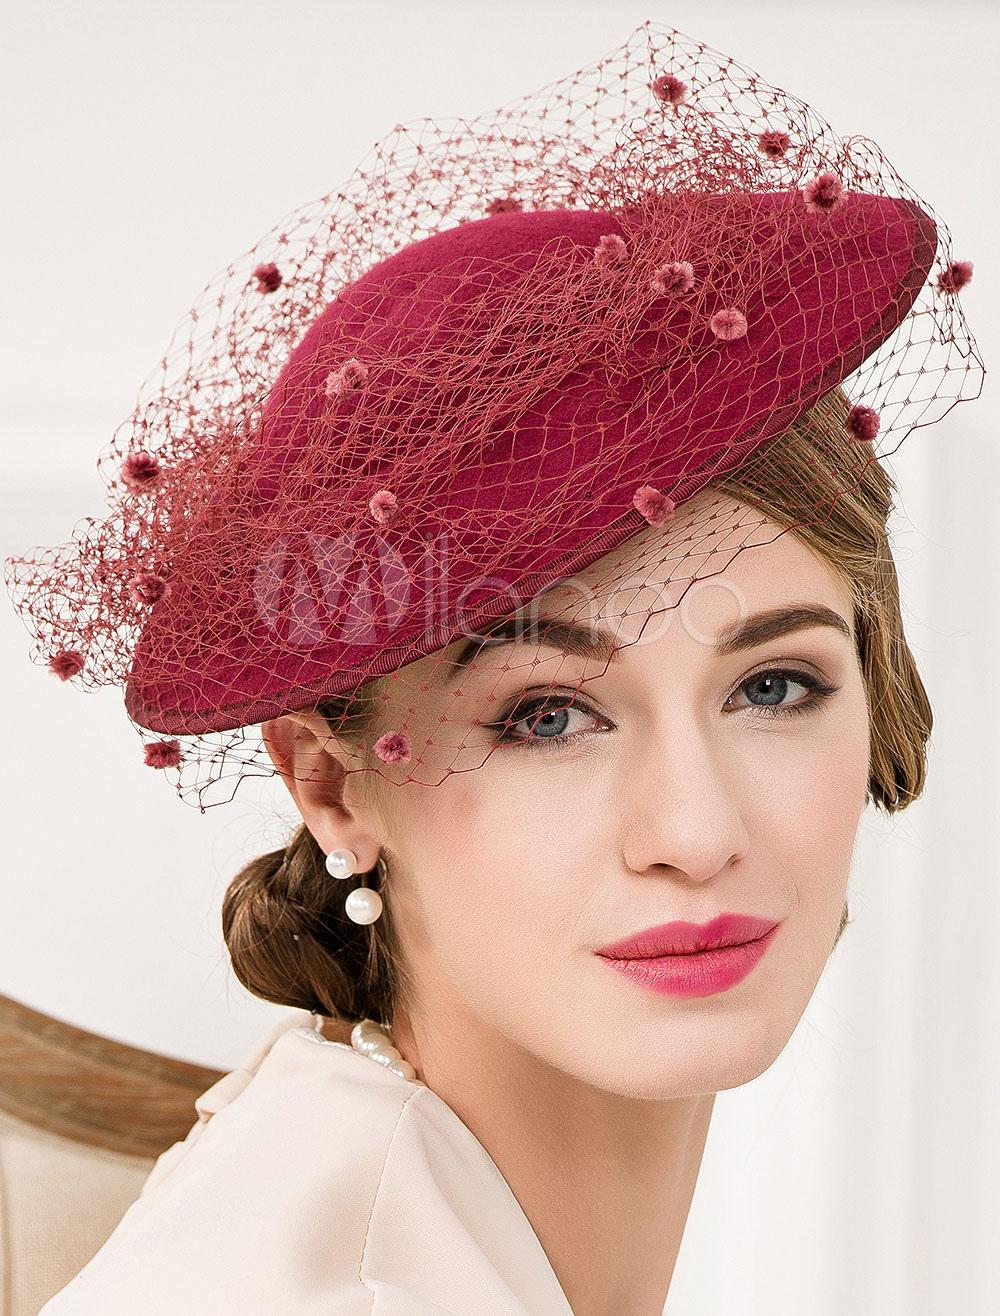 e4bfa1364 Burgundy Wool Fascinator Net Flowers Beaded Vintage Flapper Headpiece Hat  Halloween